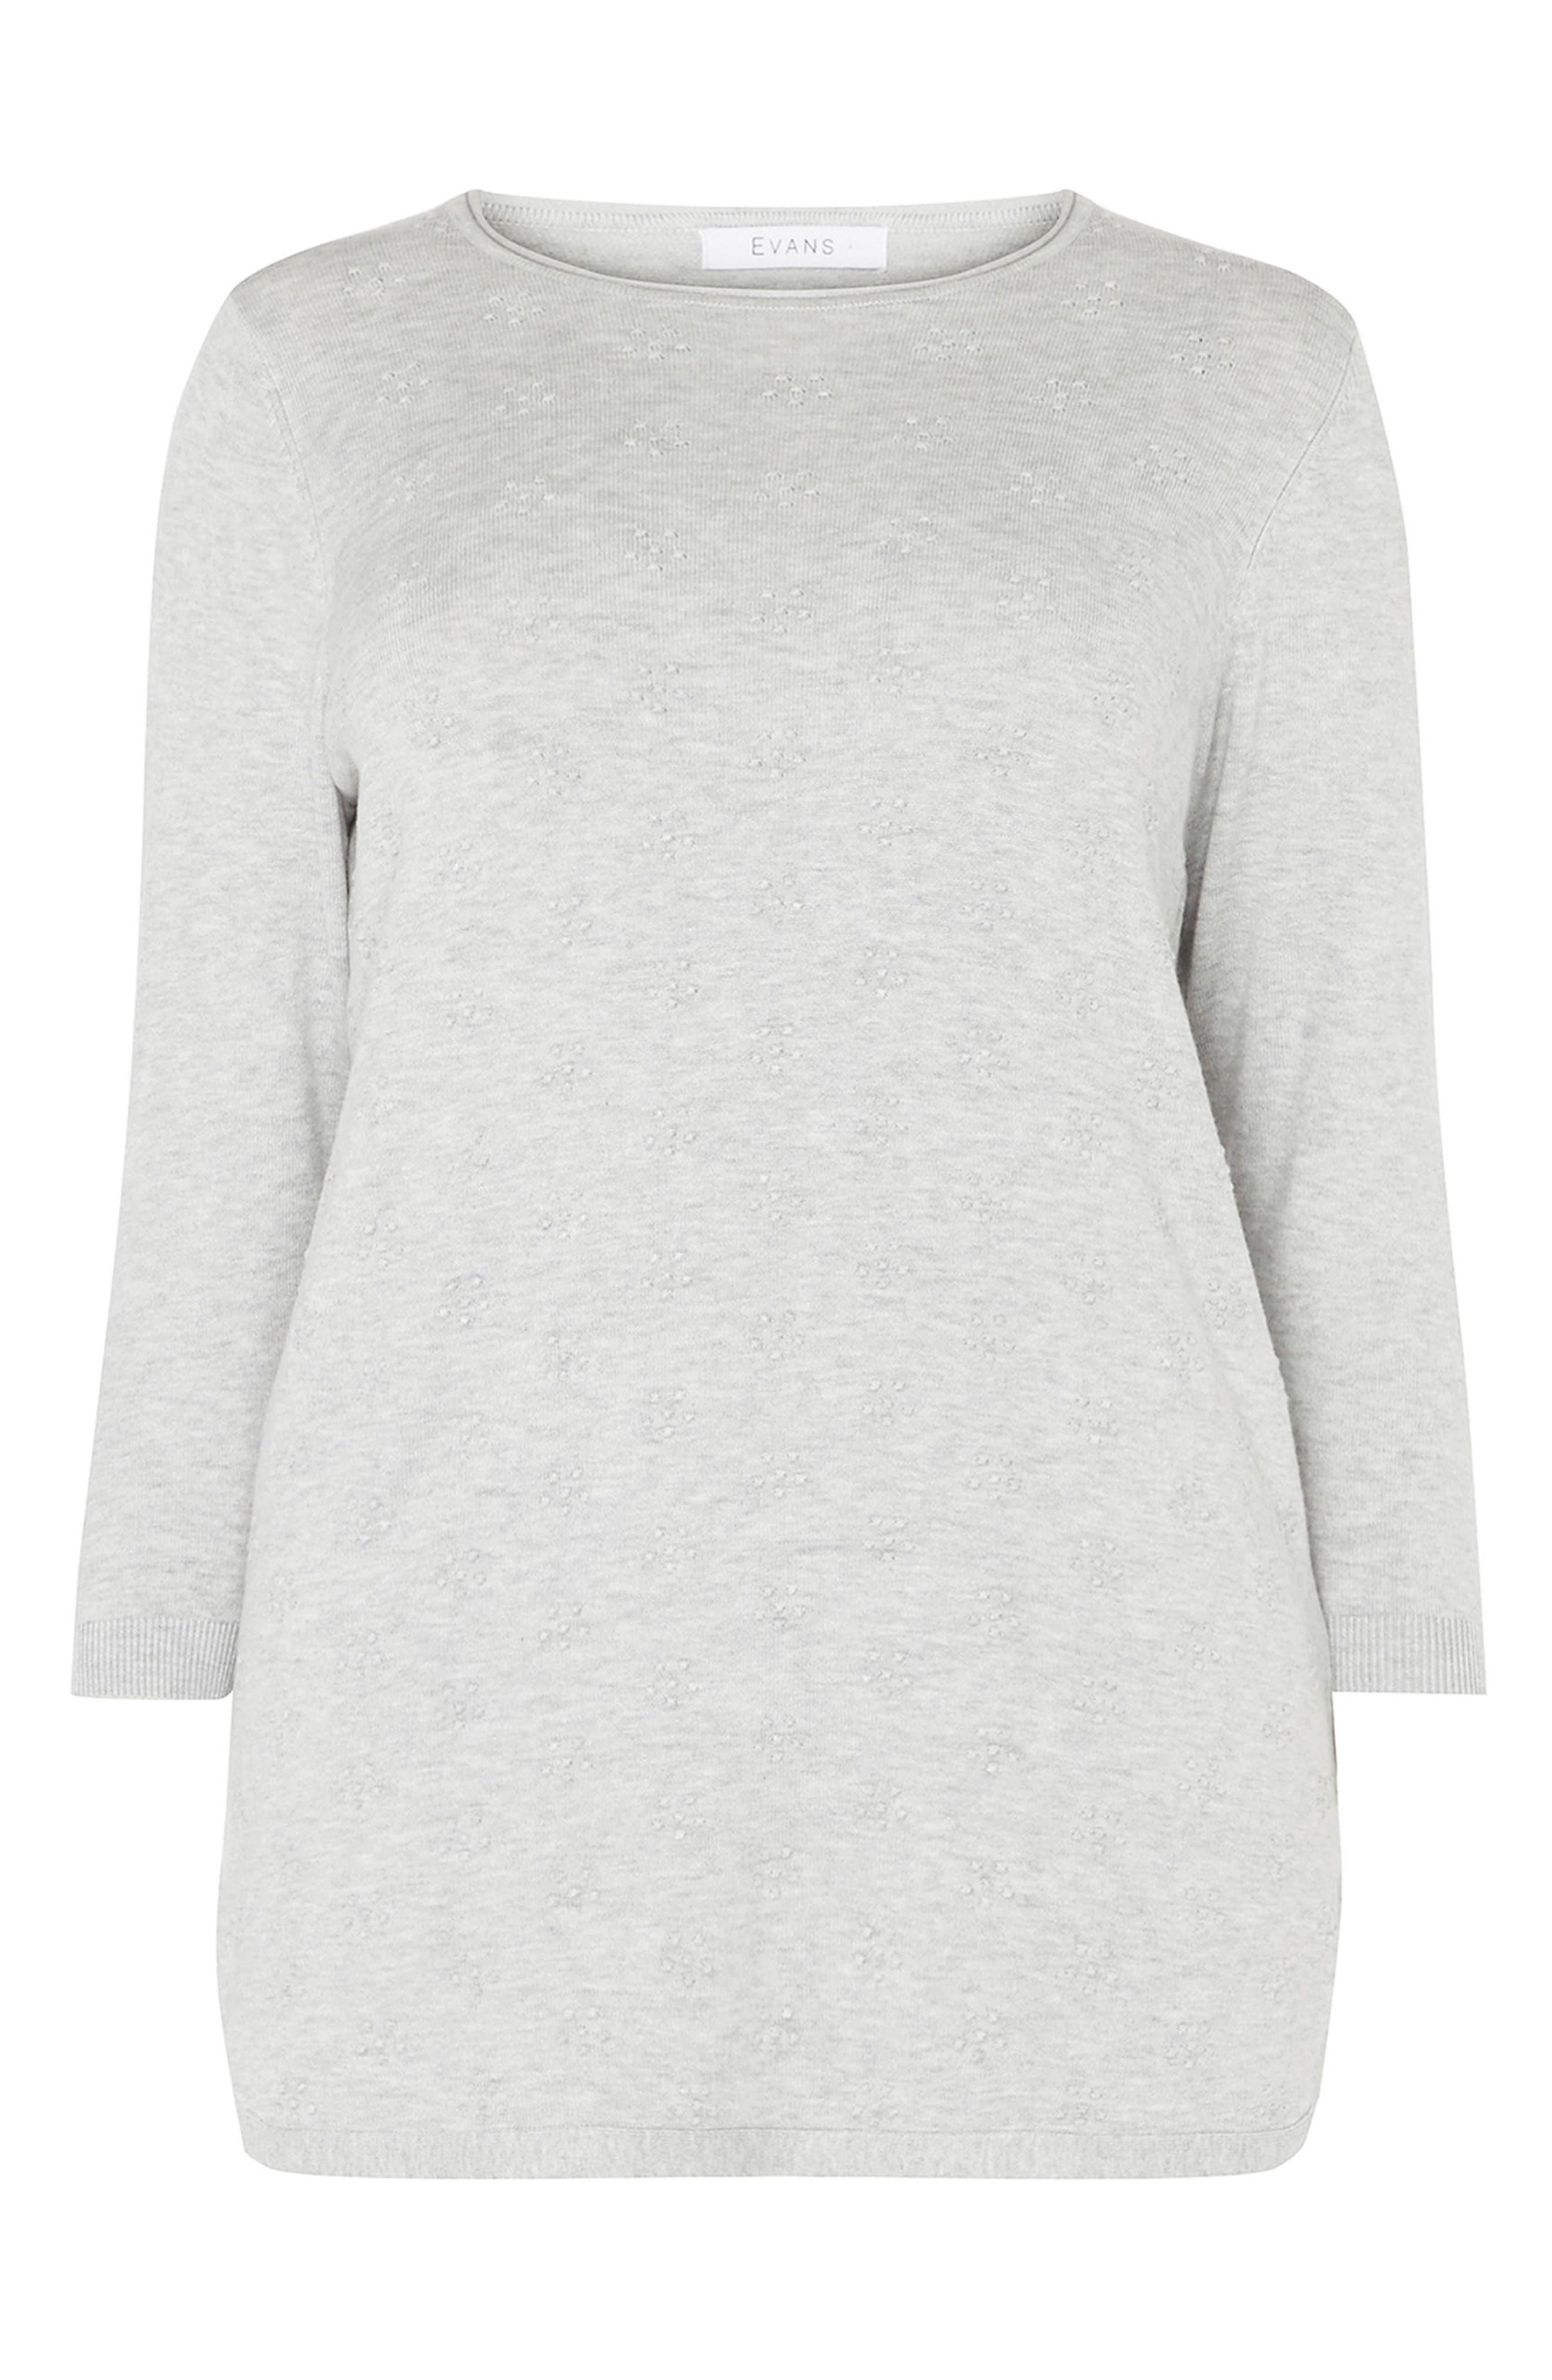 Dot Texture Sweater,                             Alternate thumbnail 4, color,                             Grey